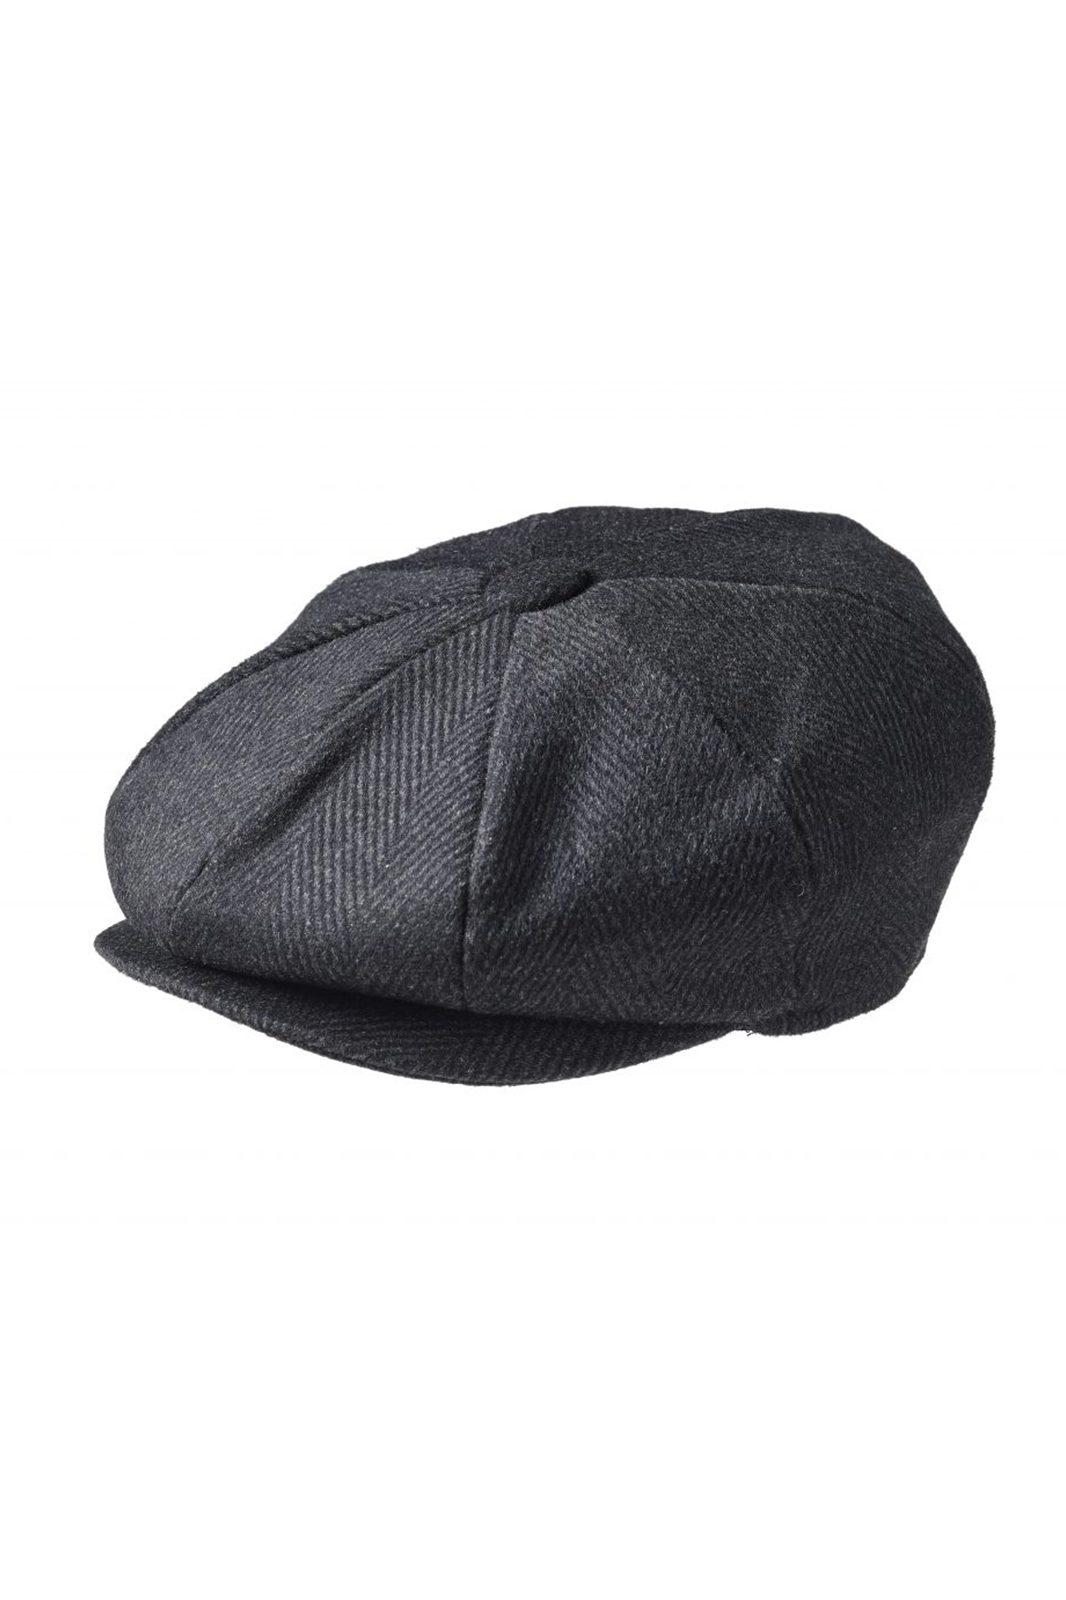 Newsboy Cap Pinstripe Black